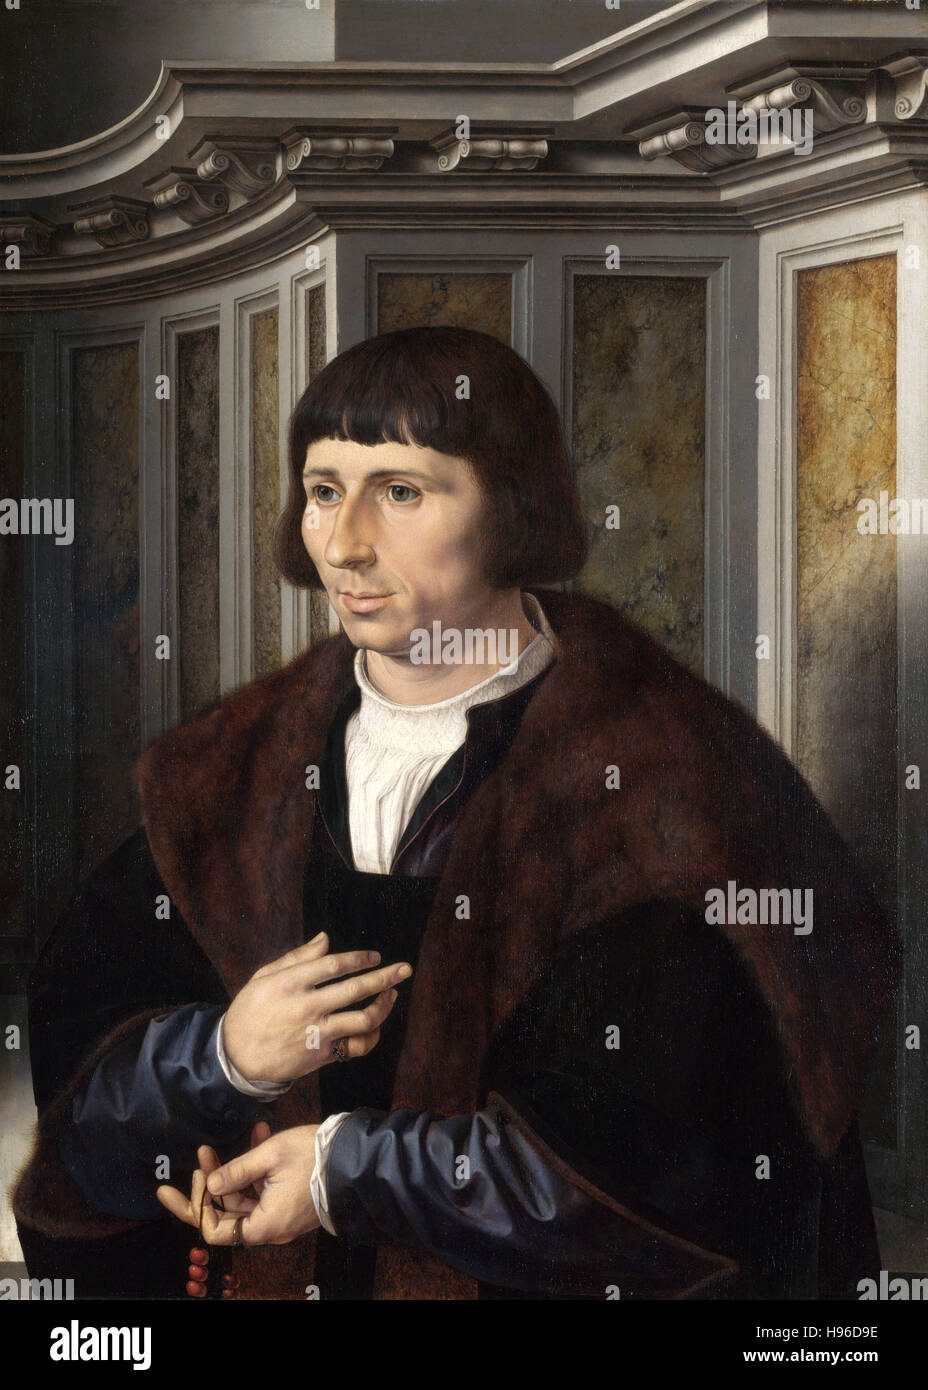 Jan Gossaert - Mann mit einem Rosenkranz - 1525 Stockbild